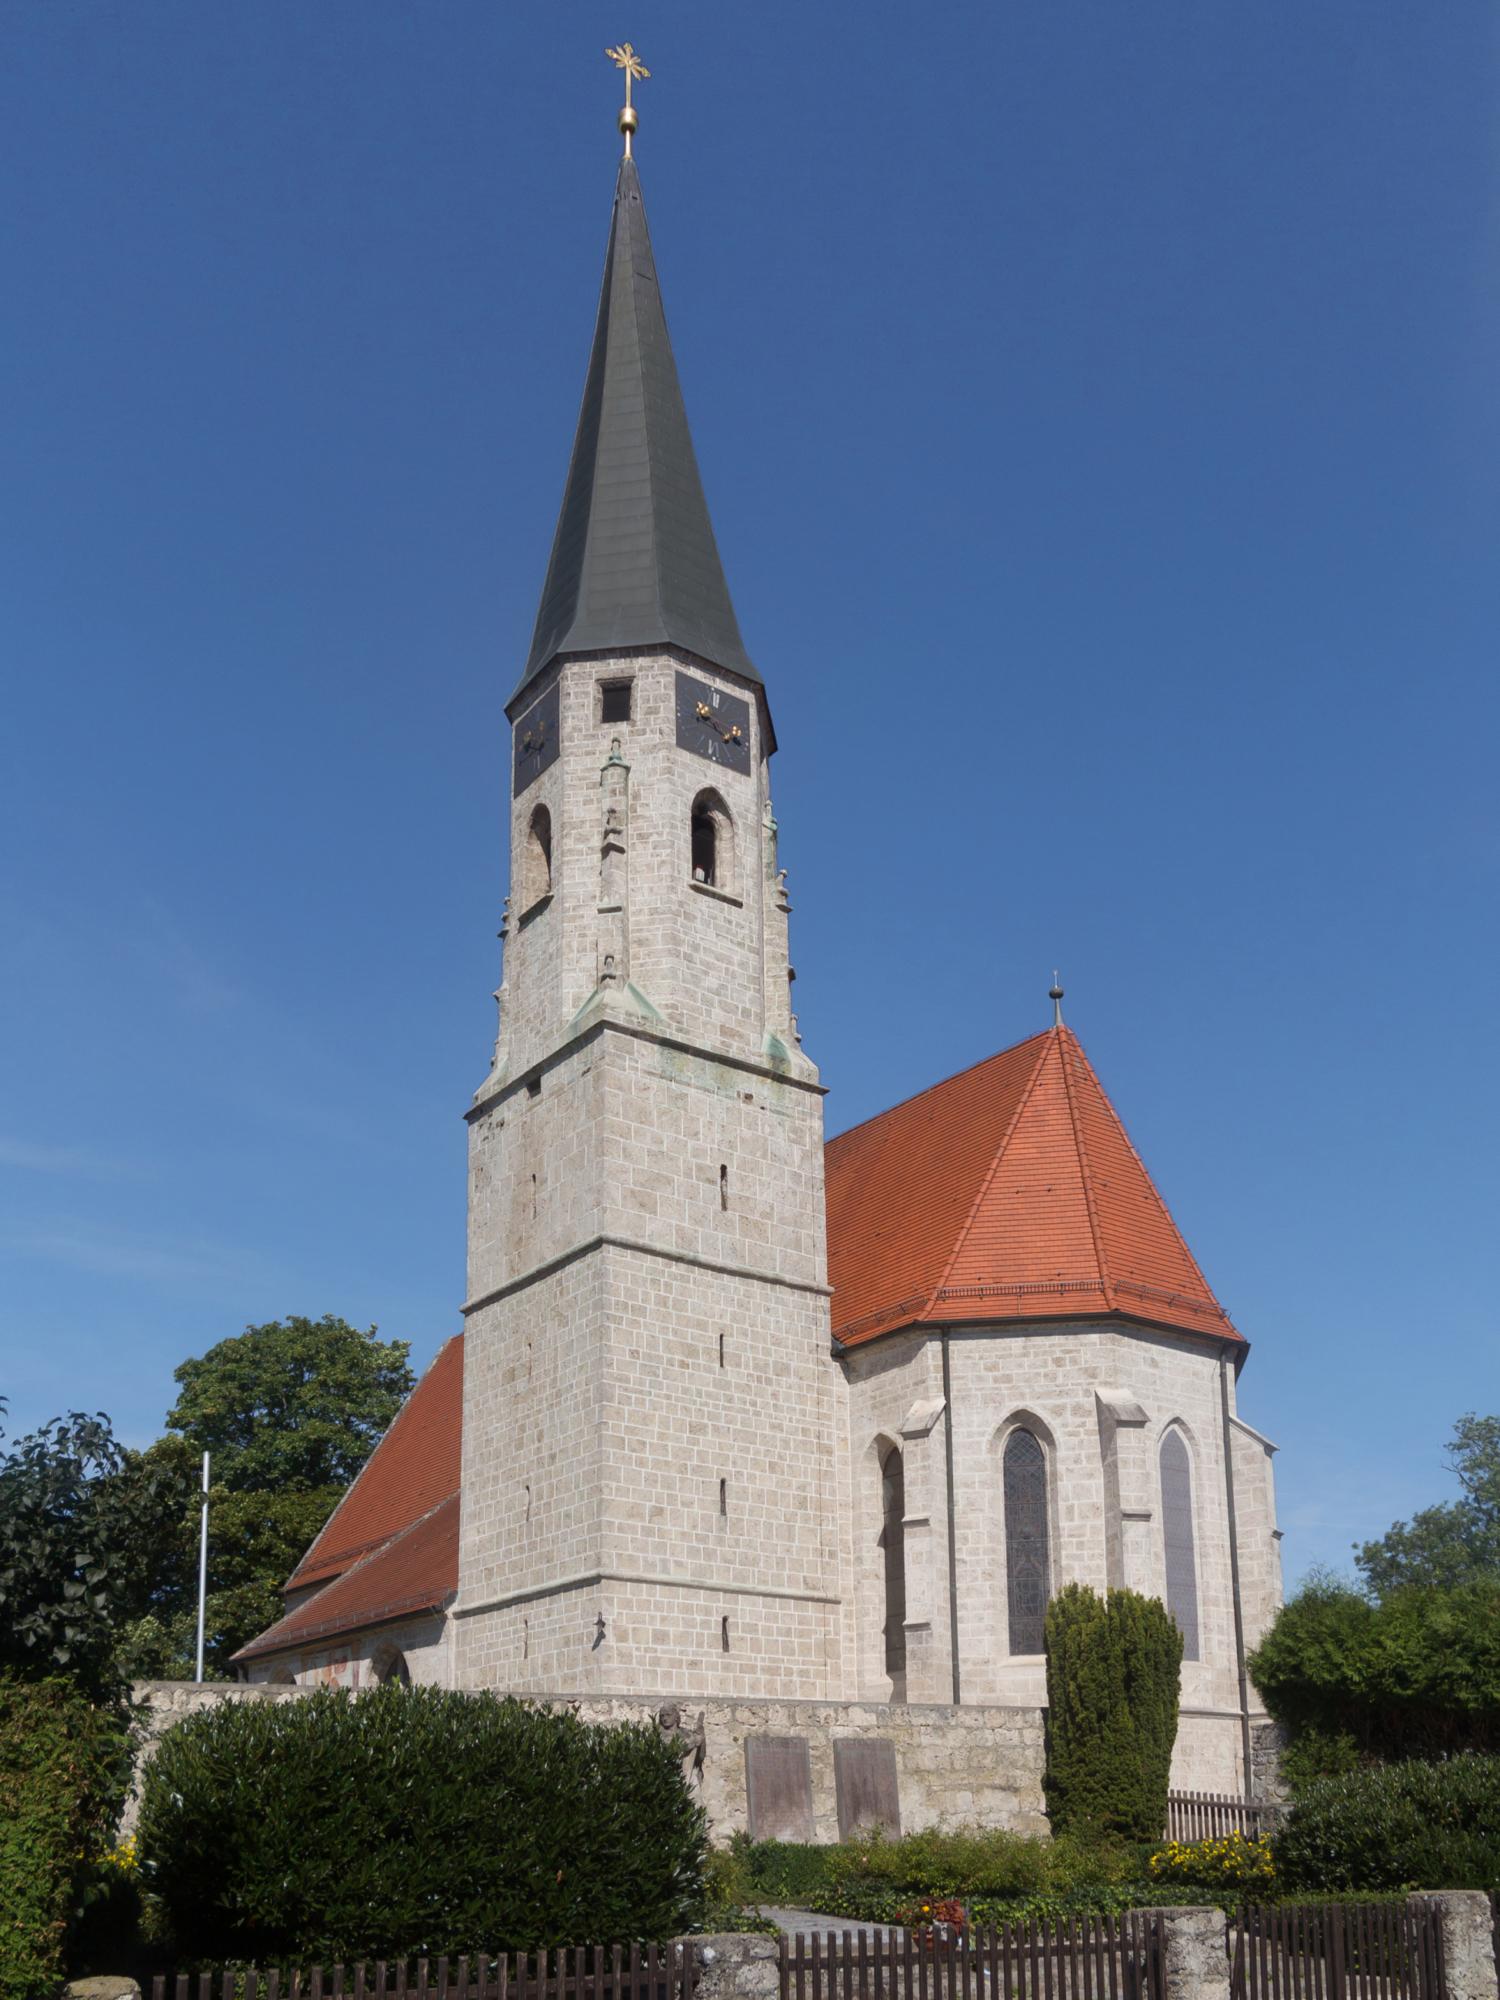 Ering2 C die Katholische Pfarrkirche Mari C3 A4 Himmelfahrt Dm D 2 77 118 7 foto3 2017 08 08 10 13